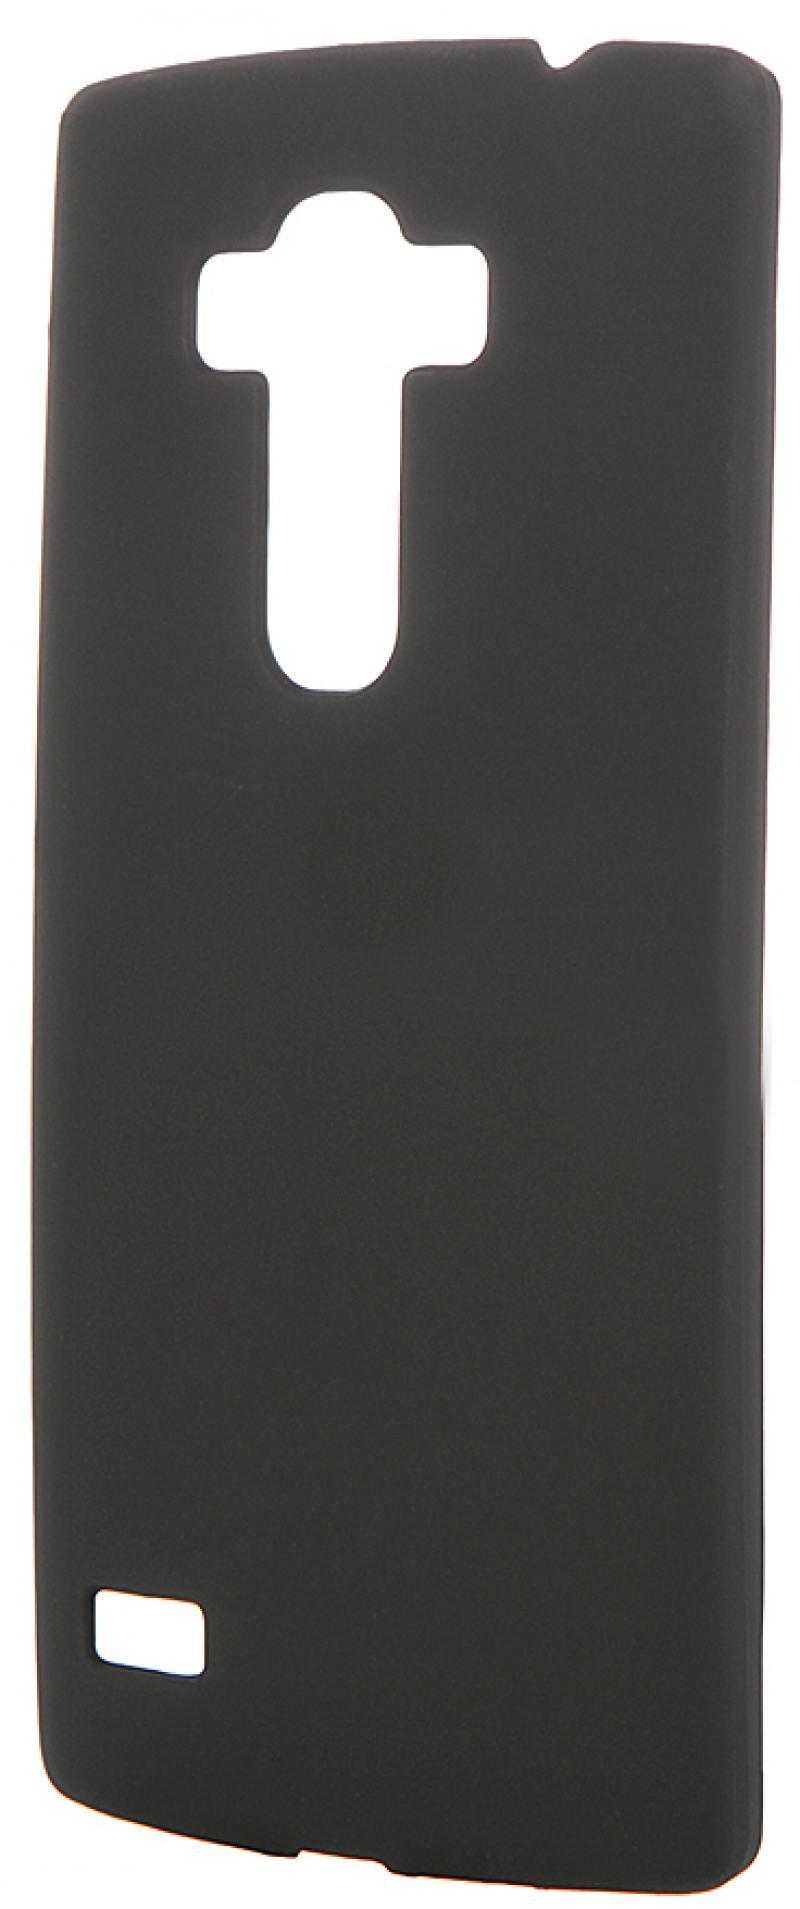 все цены на Чехол-накладка Pulsar CLIPCASE PC Soft-Touch для LG G4S (черная) онлайн